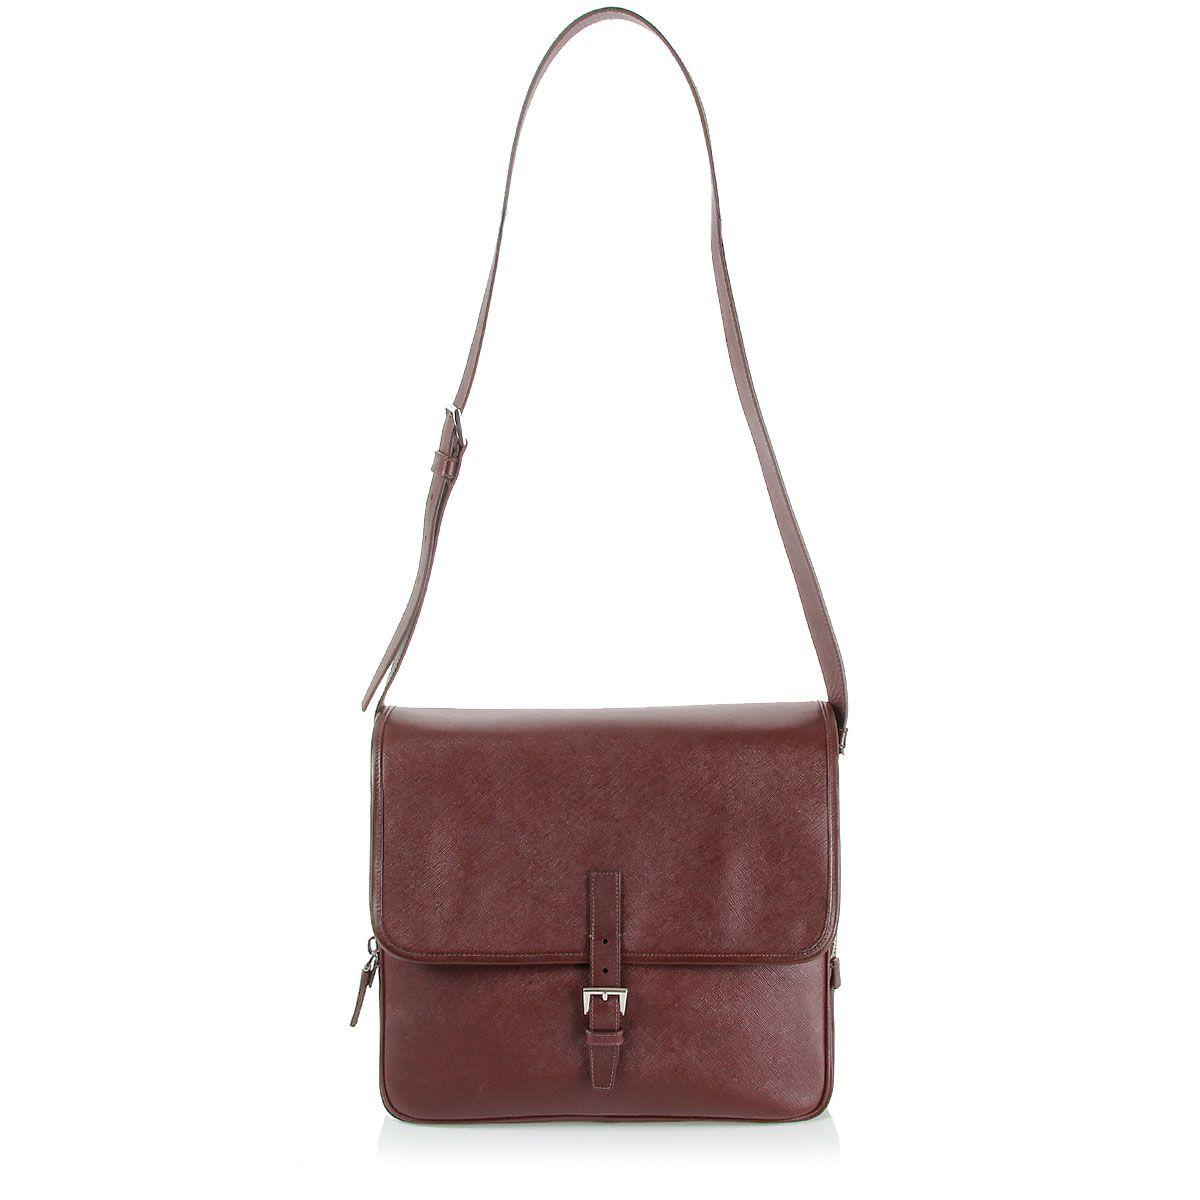 4e8826cfbbf3 Prada shoulder leather bag with flap [Art.